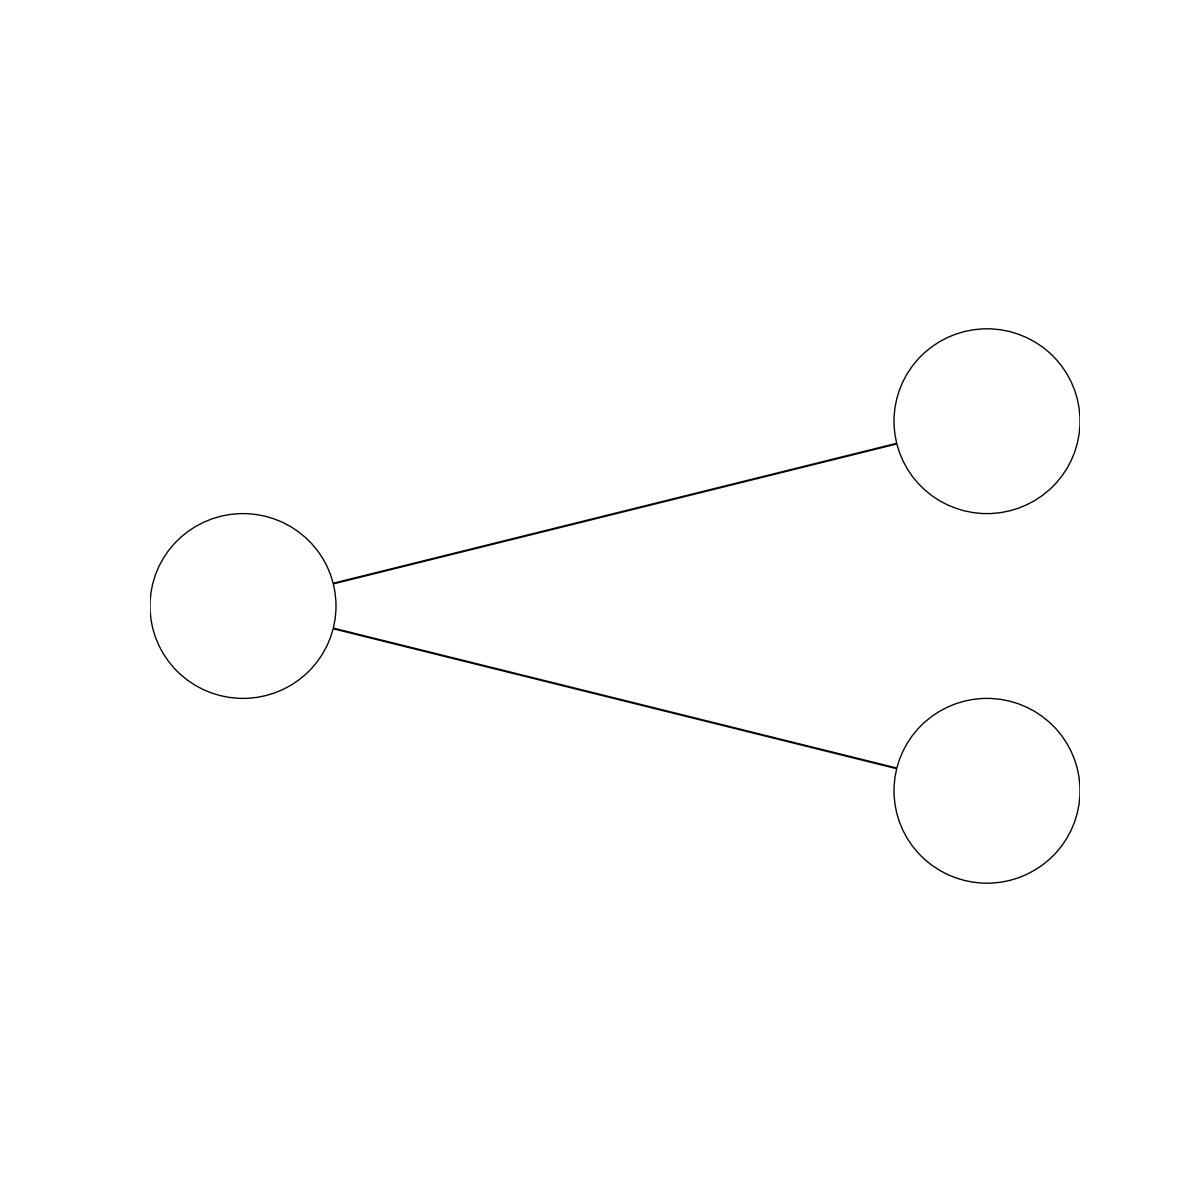 Draw Neural Network